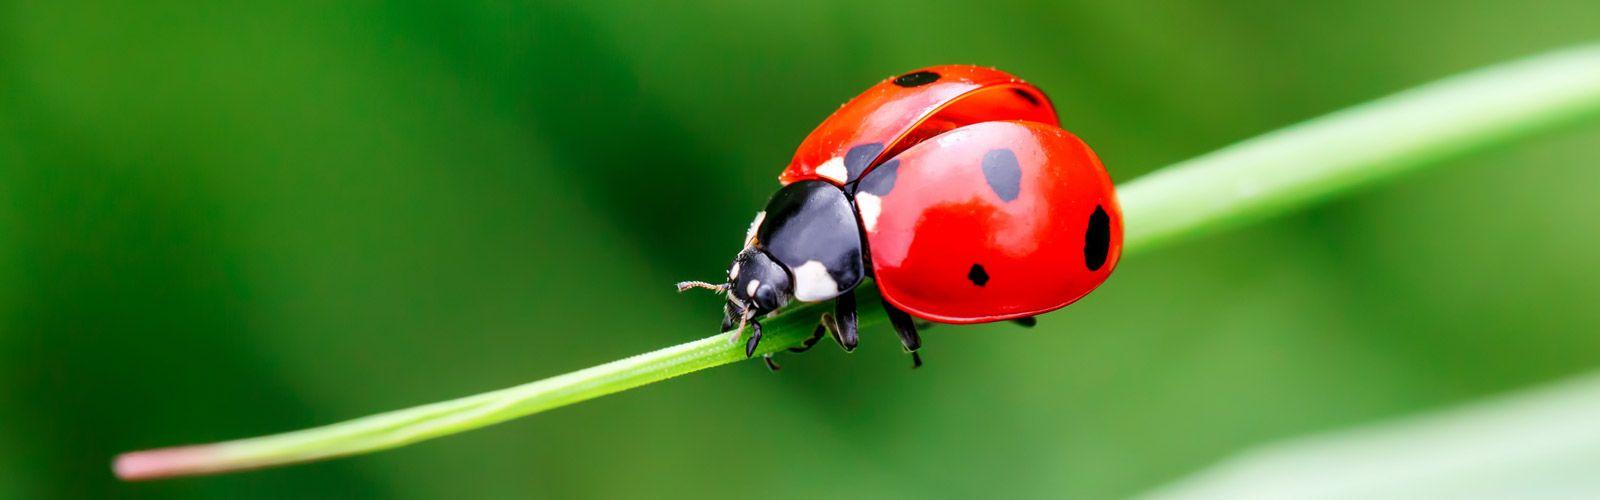 a close up of a ladybug